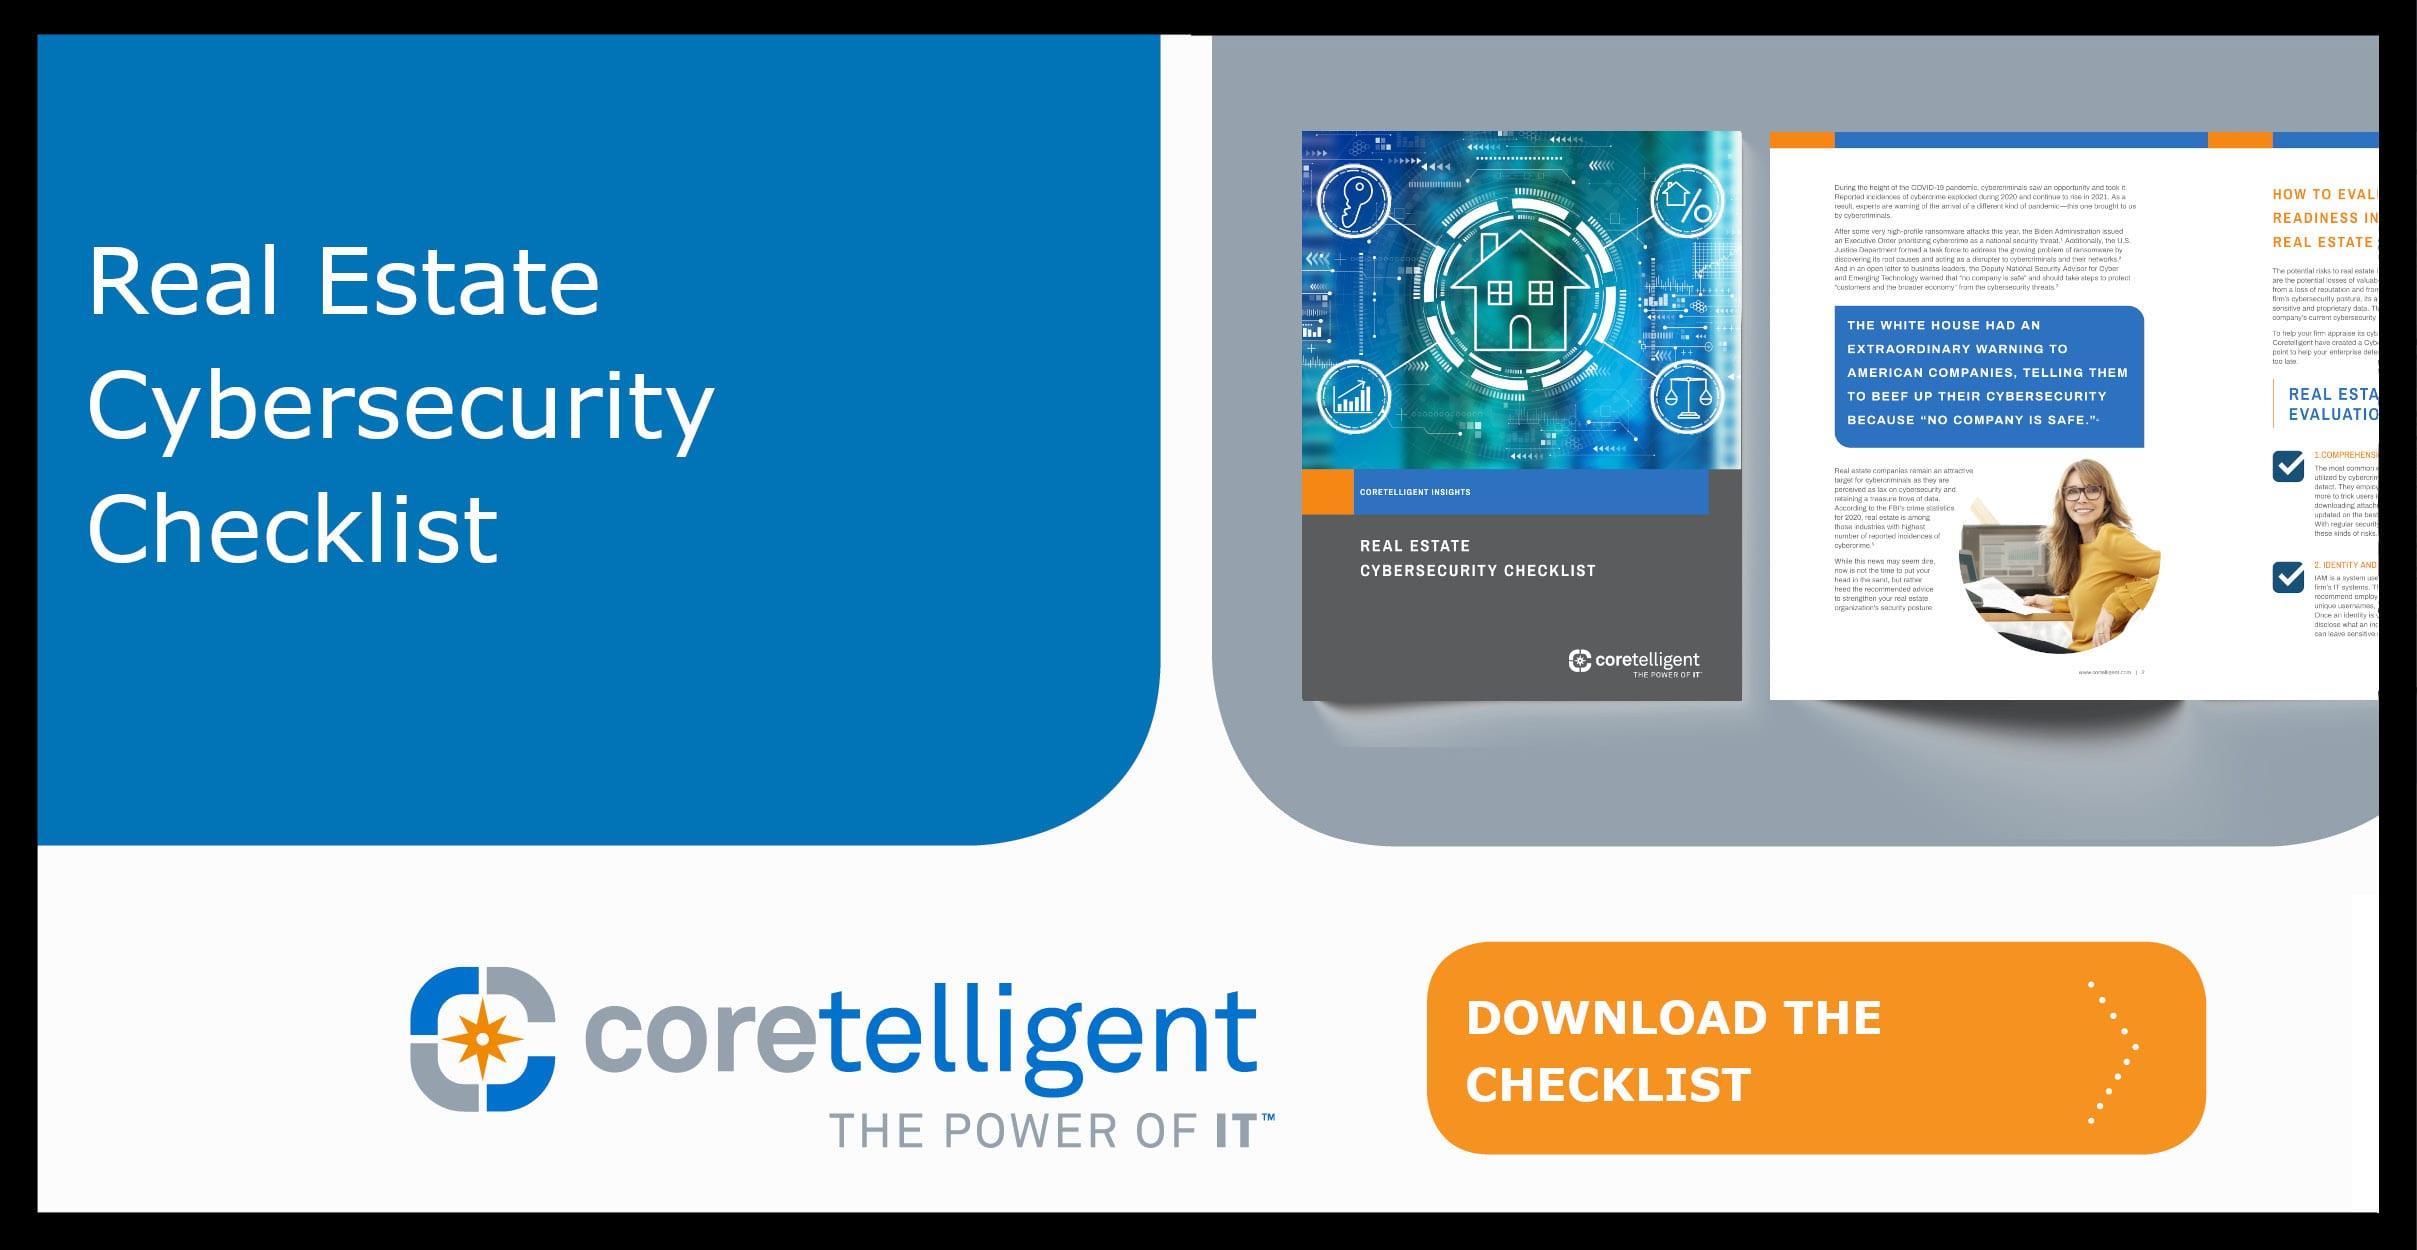 Real Estate Cybersecurity Checklist